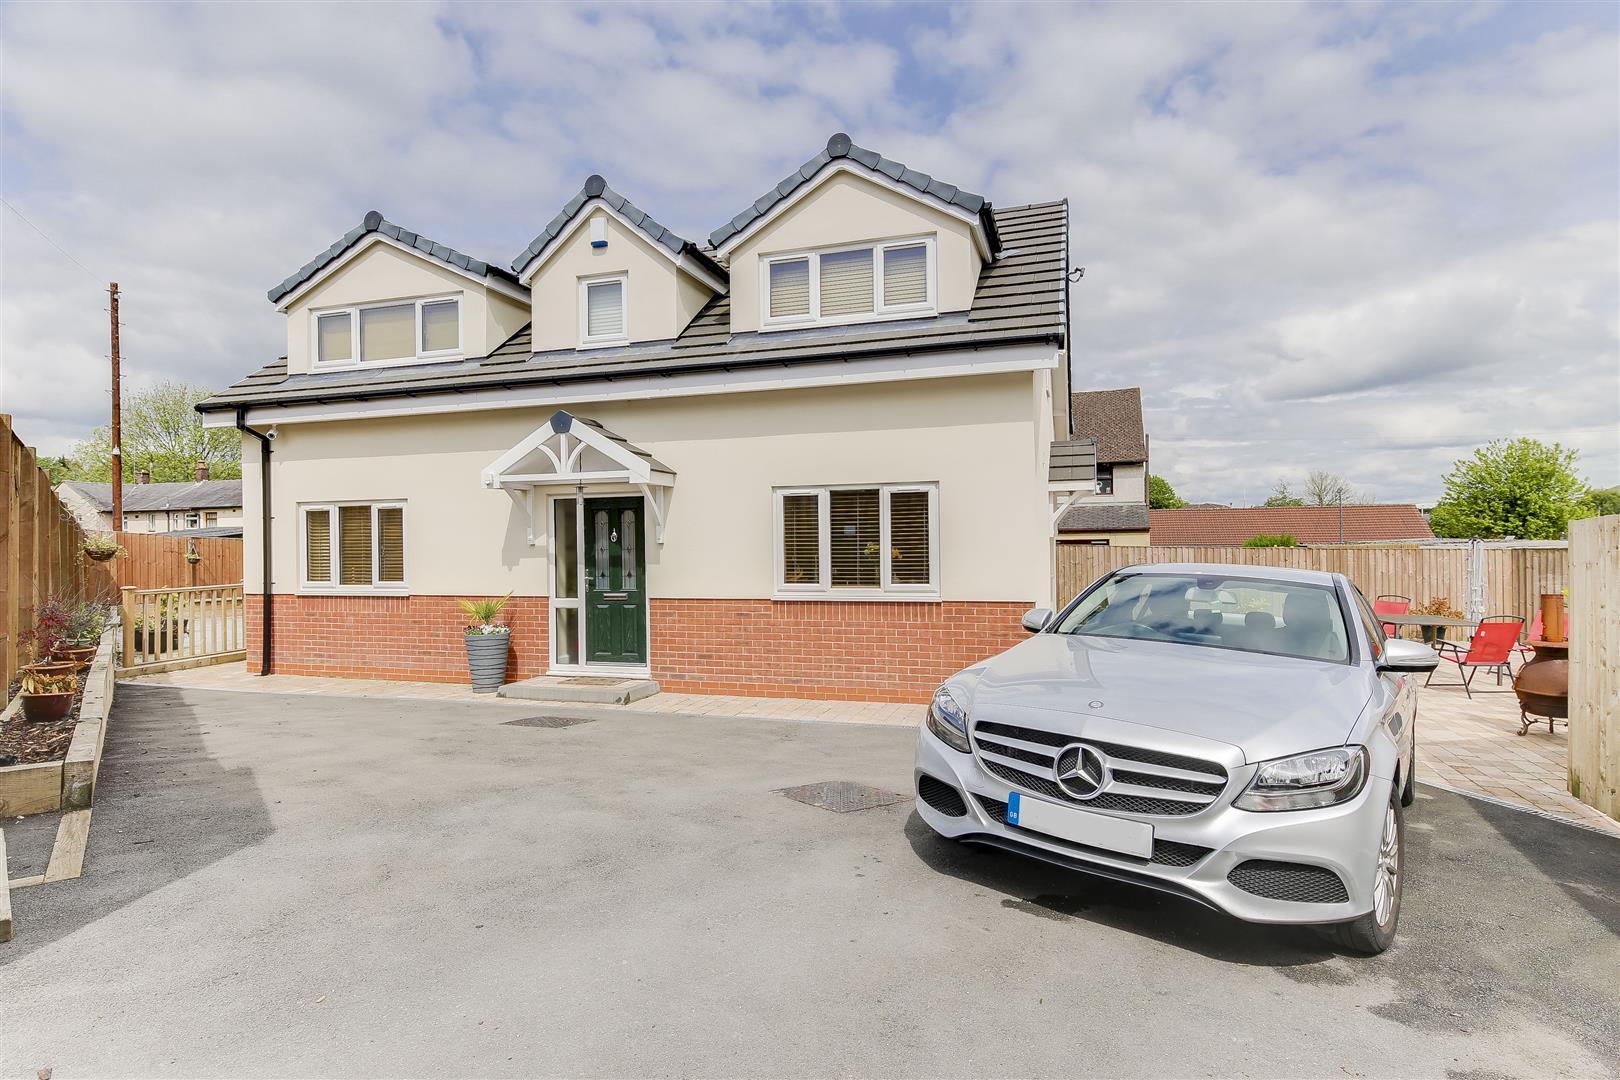 3 Bedrooms Property for sale in Norfolk Drive, Haslingden, Rossendale